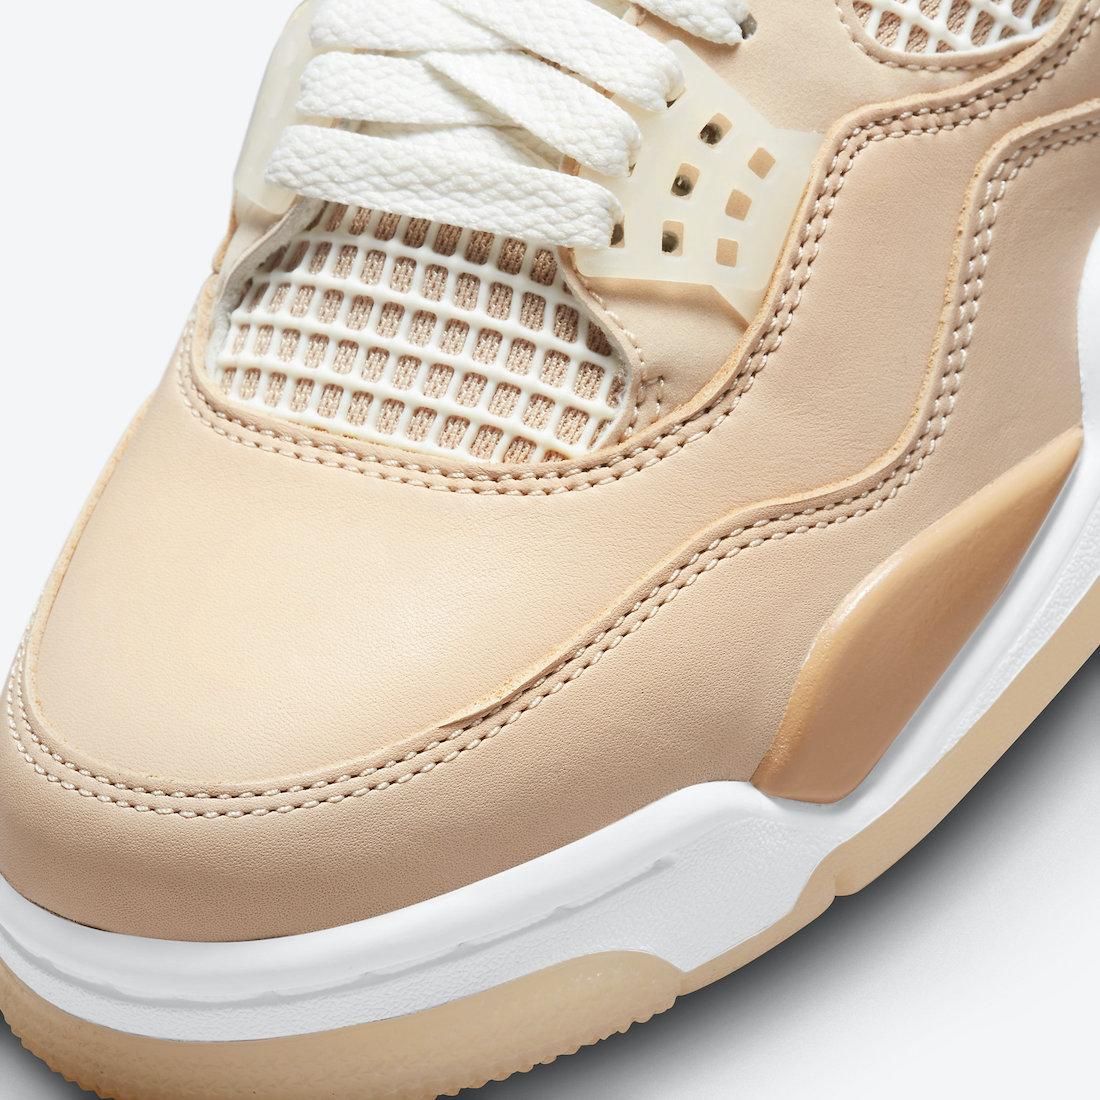 Air-Jordan-4-Shimmer-WMNS-DJ0675-200-Release-Date-Price-6